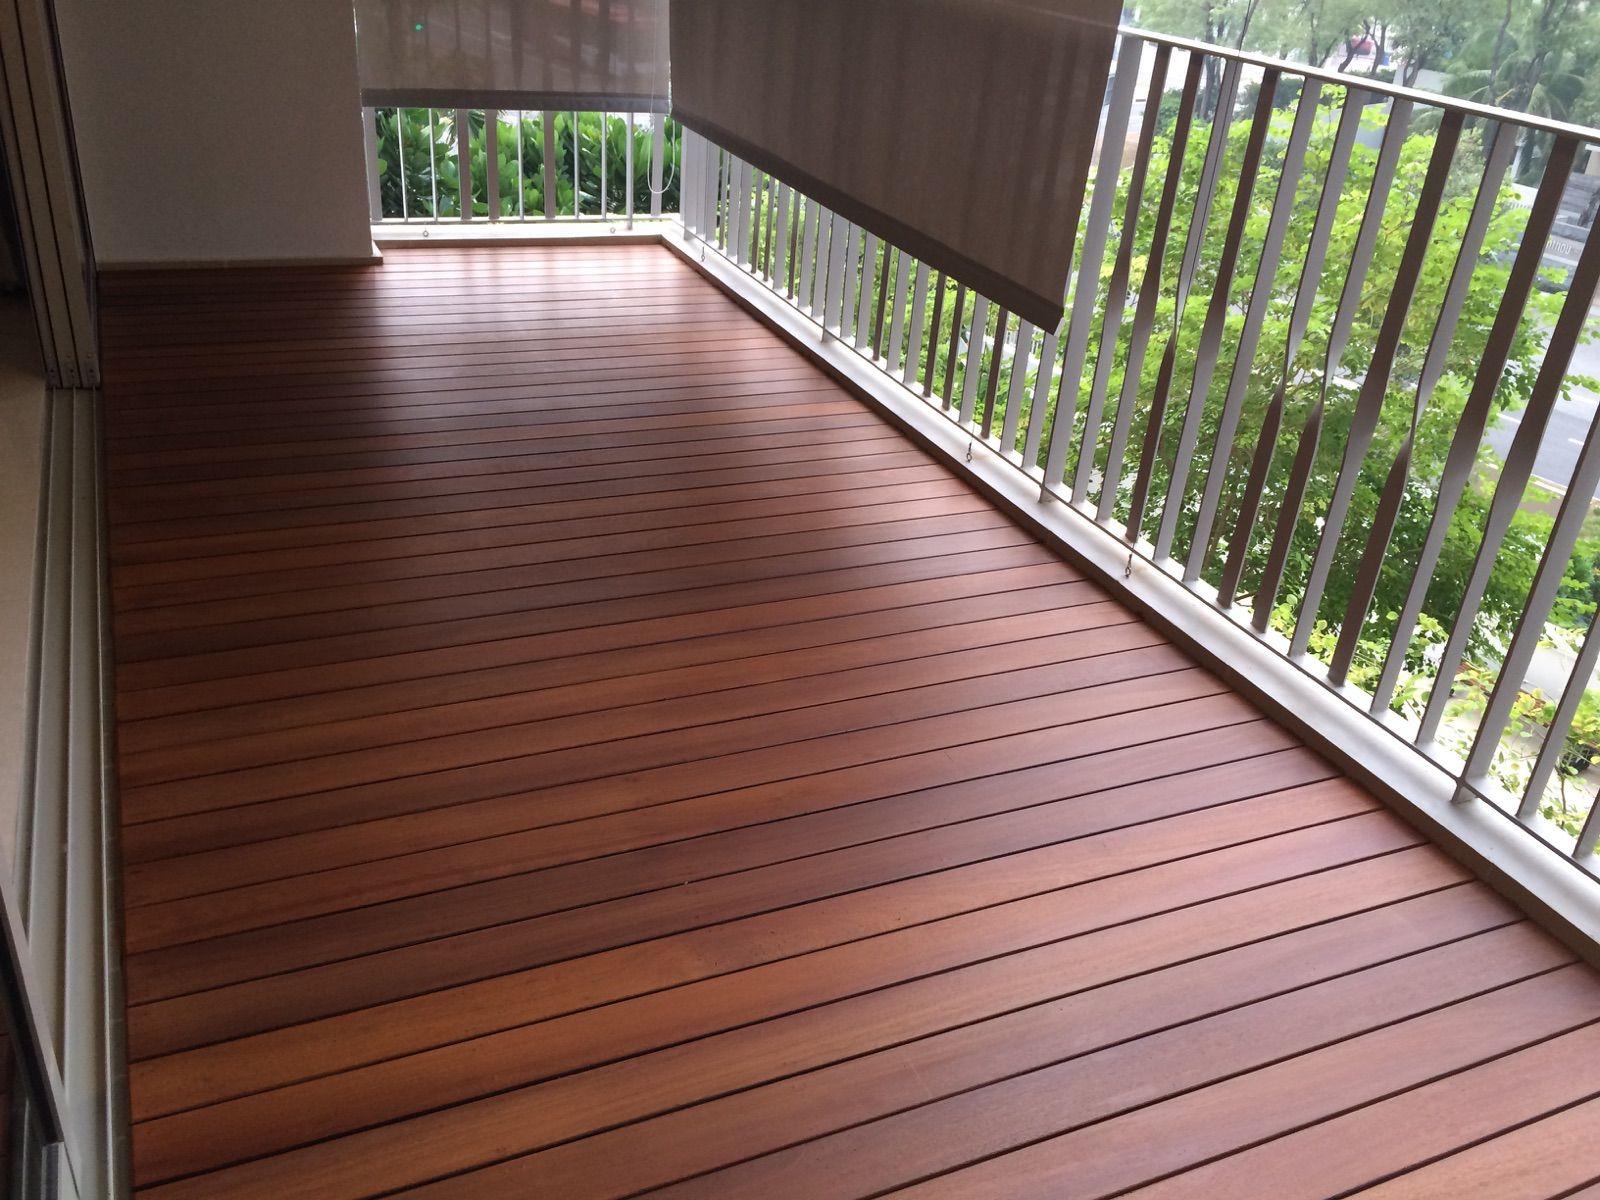 composite decking tiles prices Decks and porches, Wooden